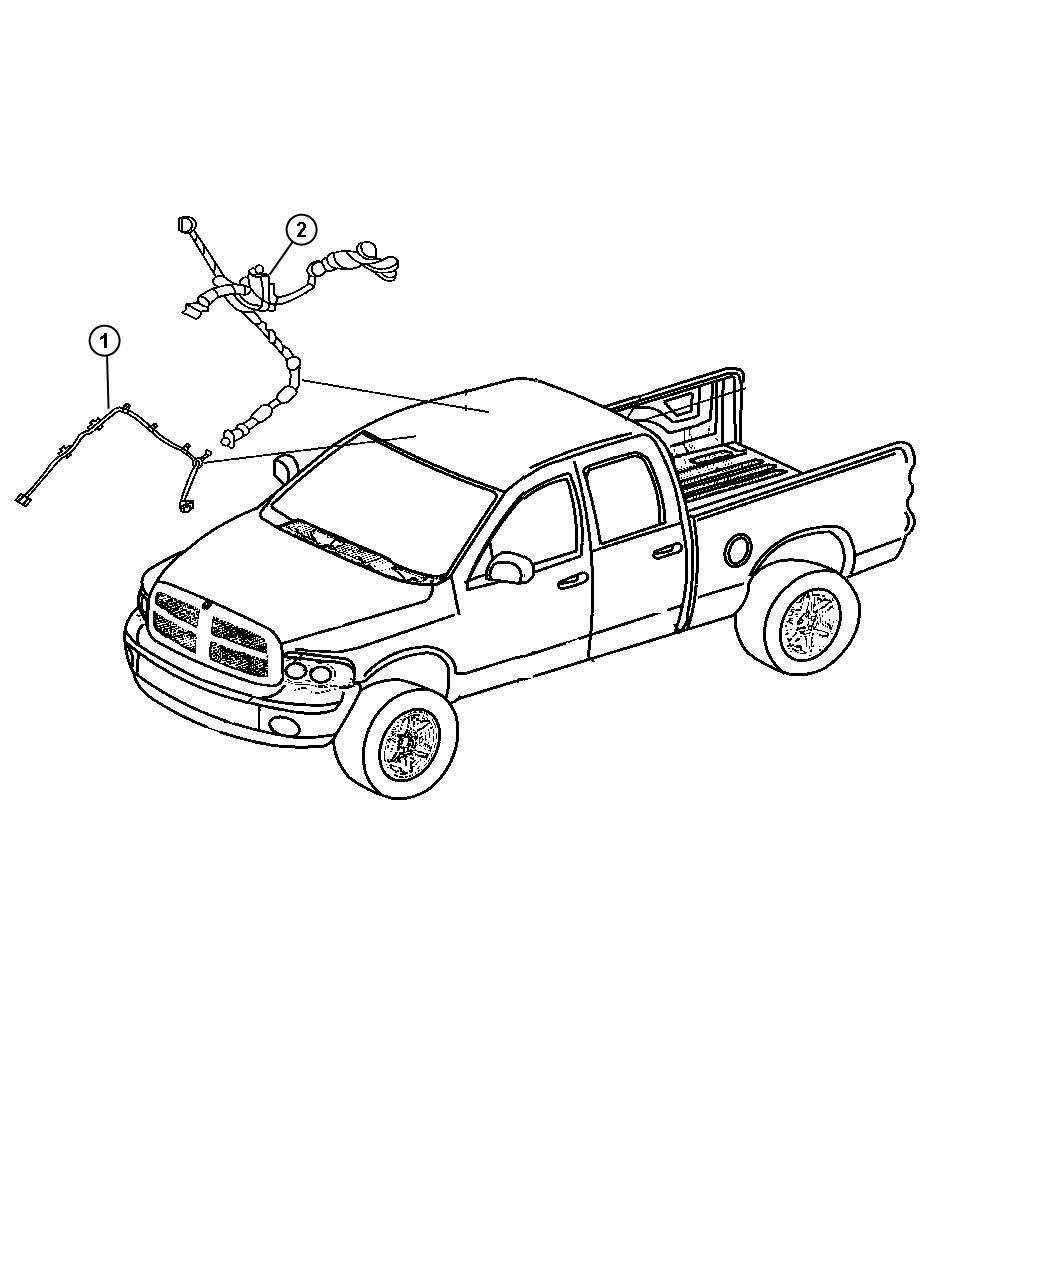 dodge ram 2500 wiring header rear view auto dim mirror. Black Bedroom Furniture Sets. Home Design Ideas